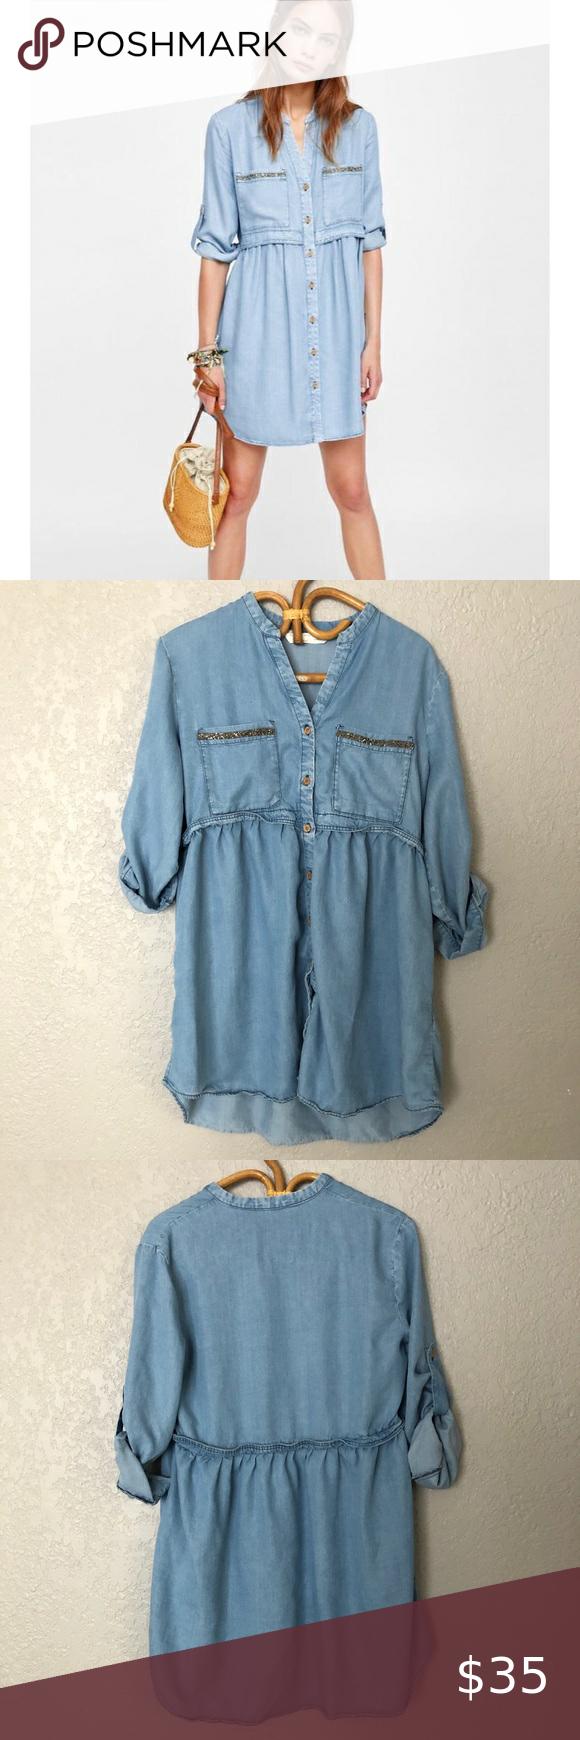 Zara Denim Shirt Dress | Long sleeve print dress, Denim shirt ...